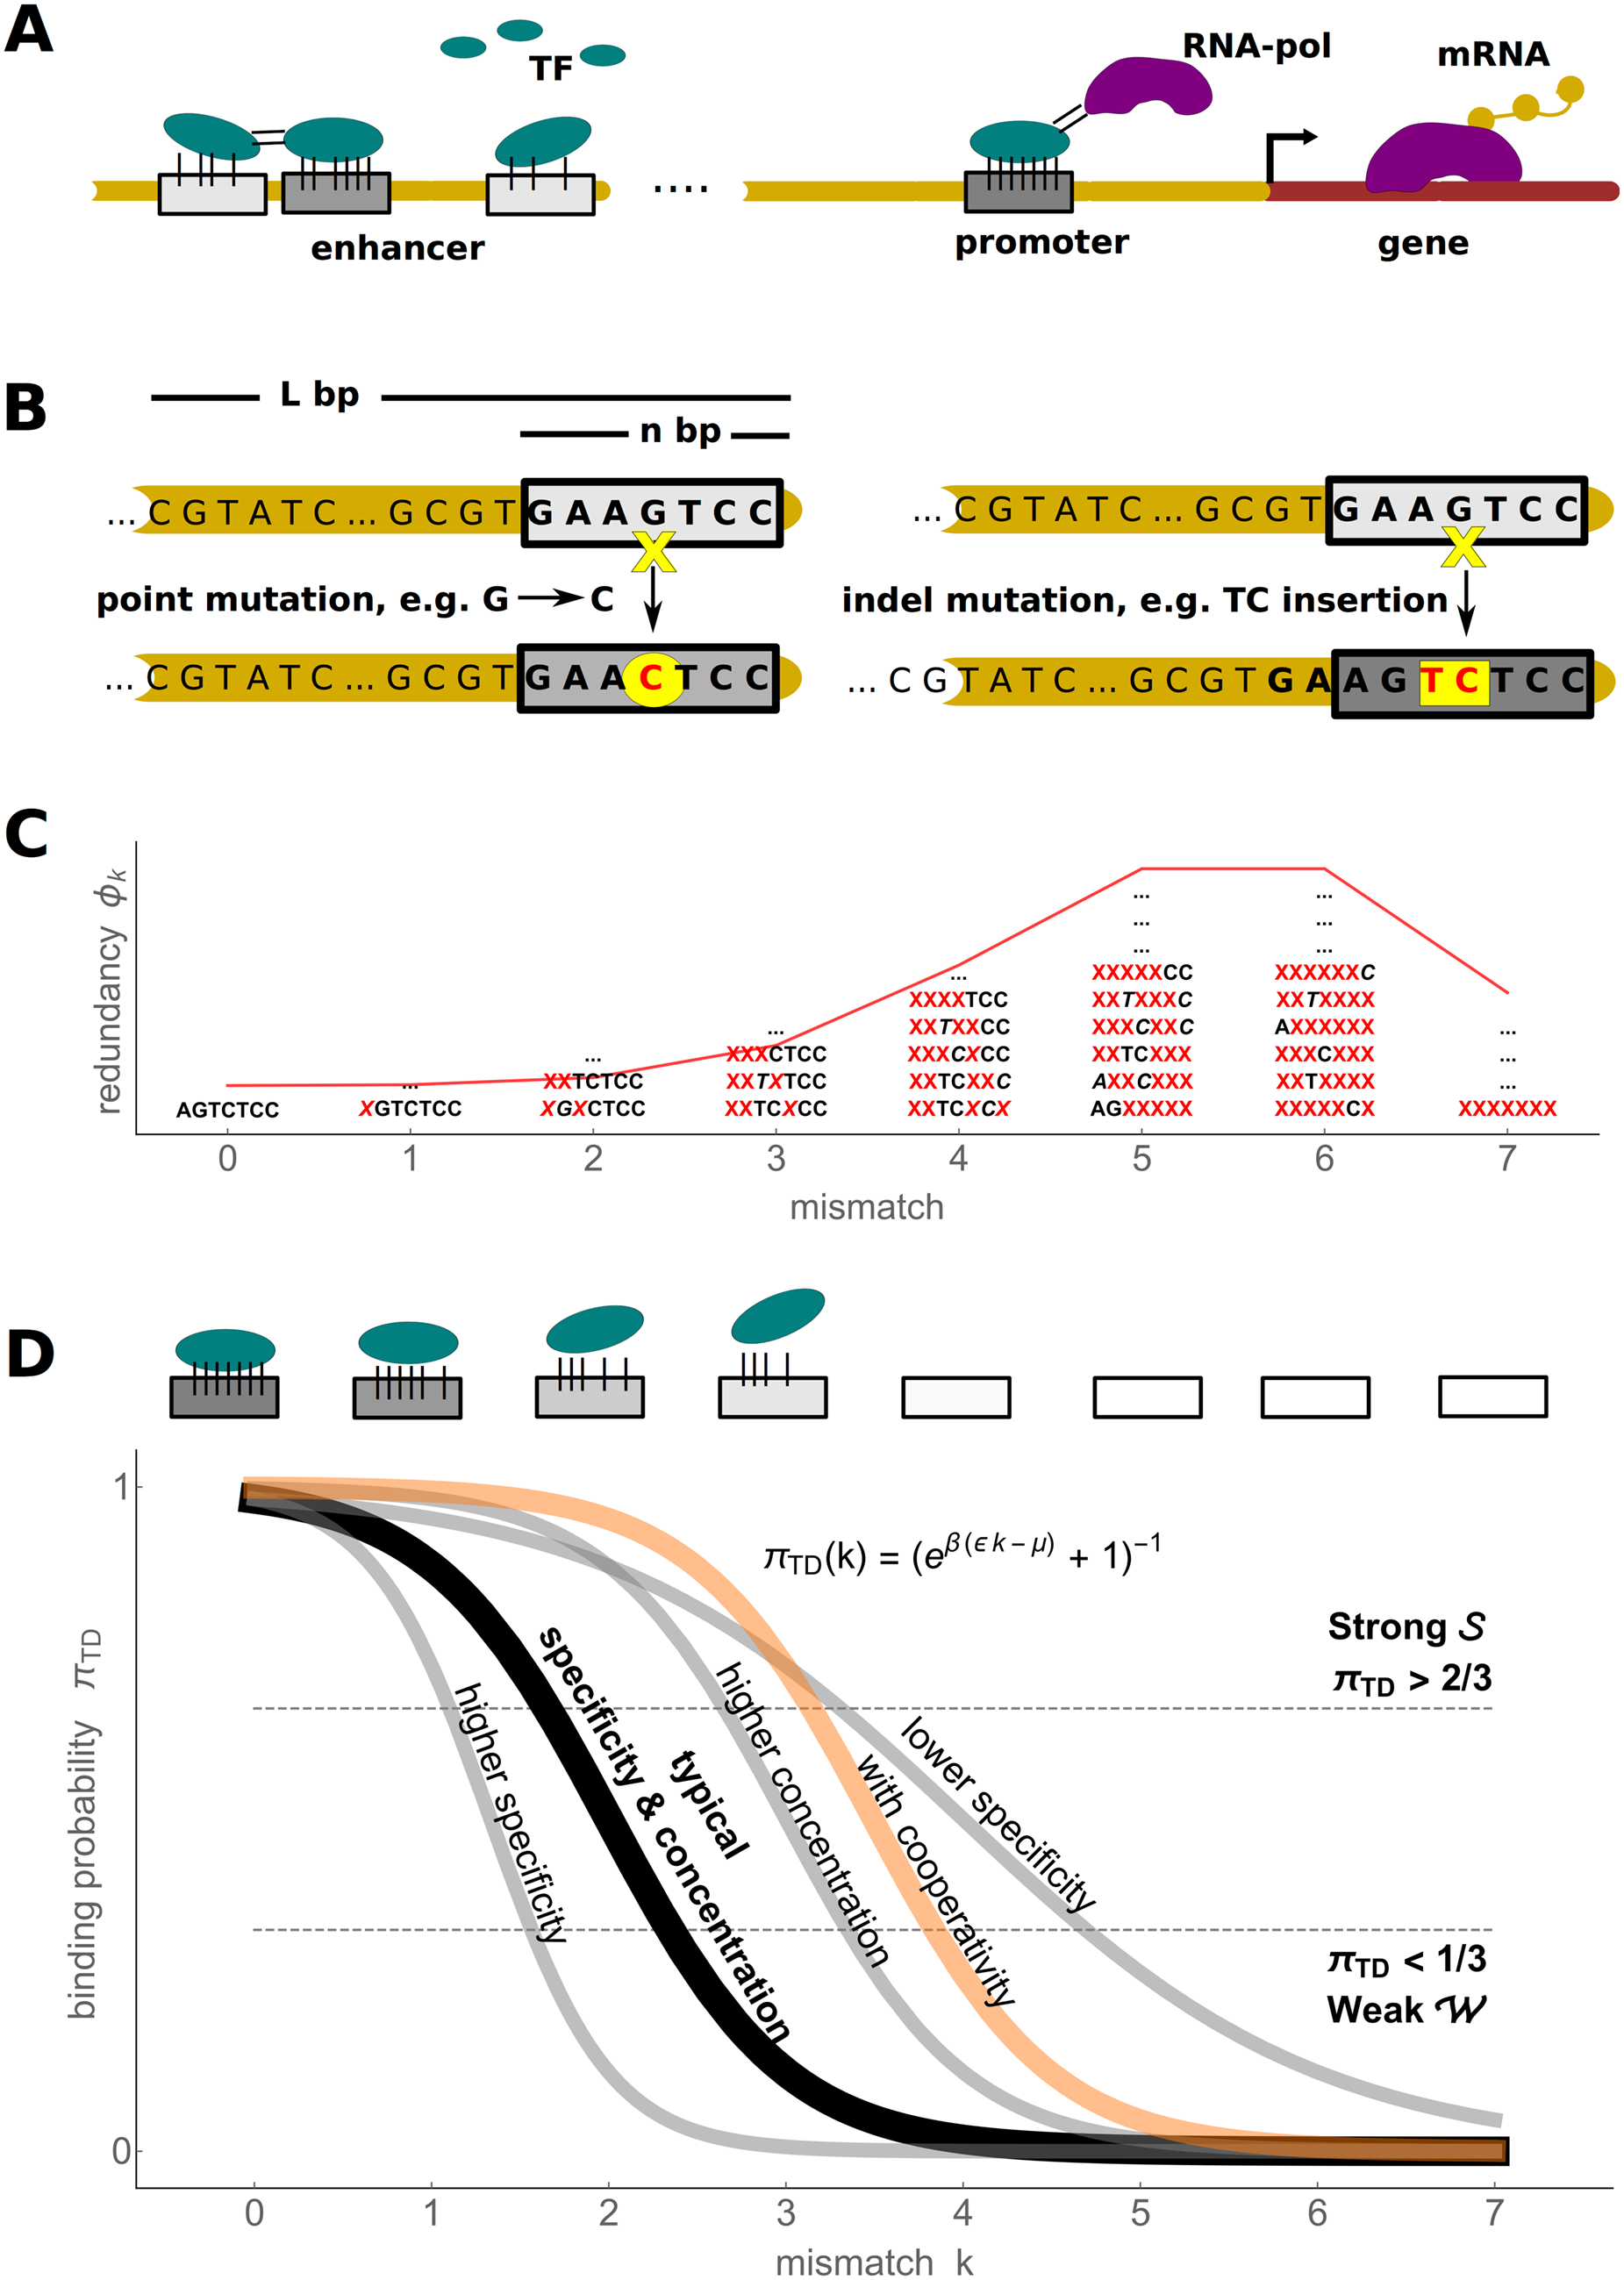 Biophysics of transcription regulation.